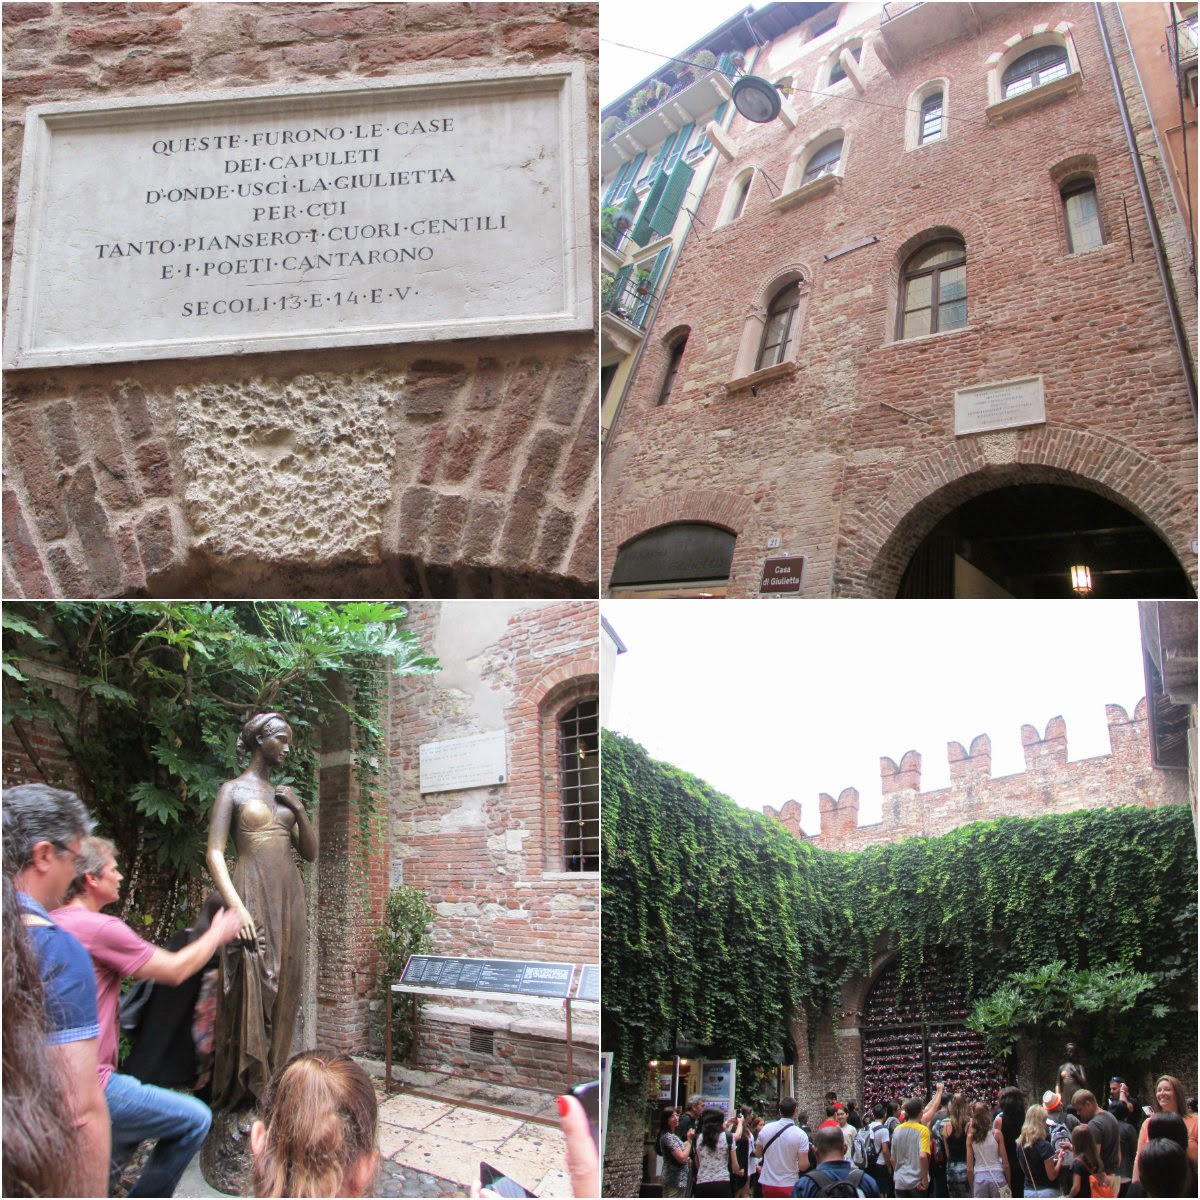 Itália, Verona, Centro, Casa Romeo e Giulietta